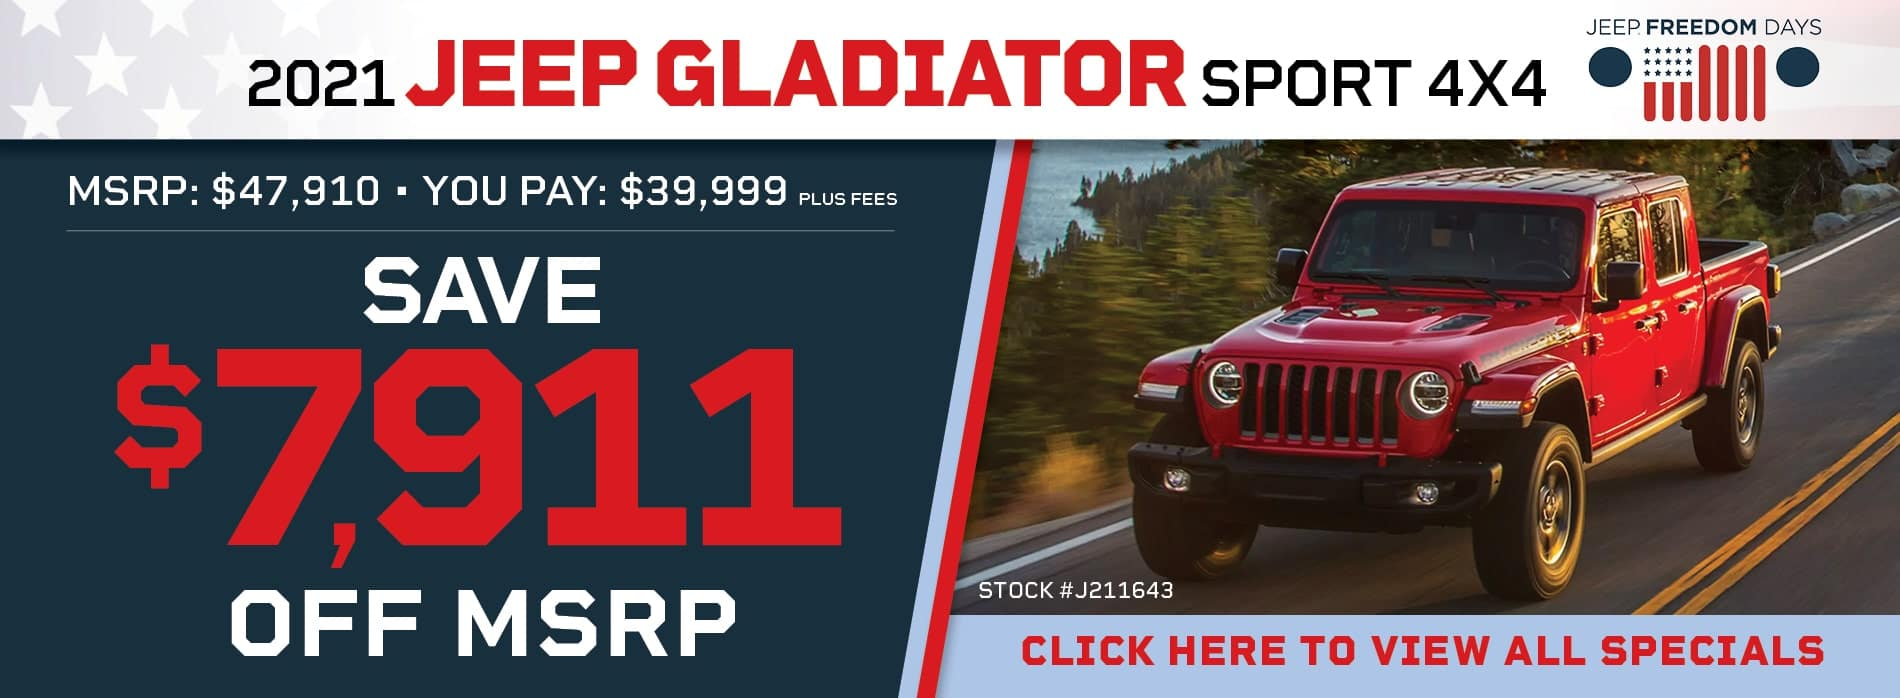 060421 Jeep Banners6-min